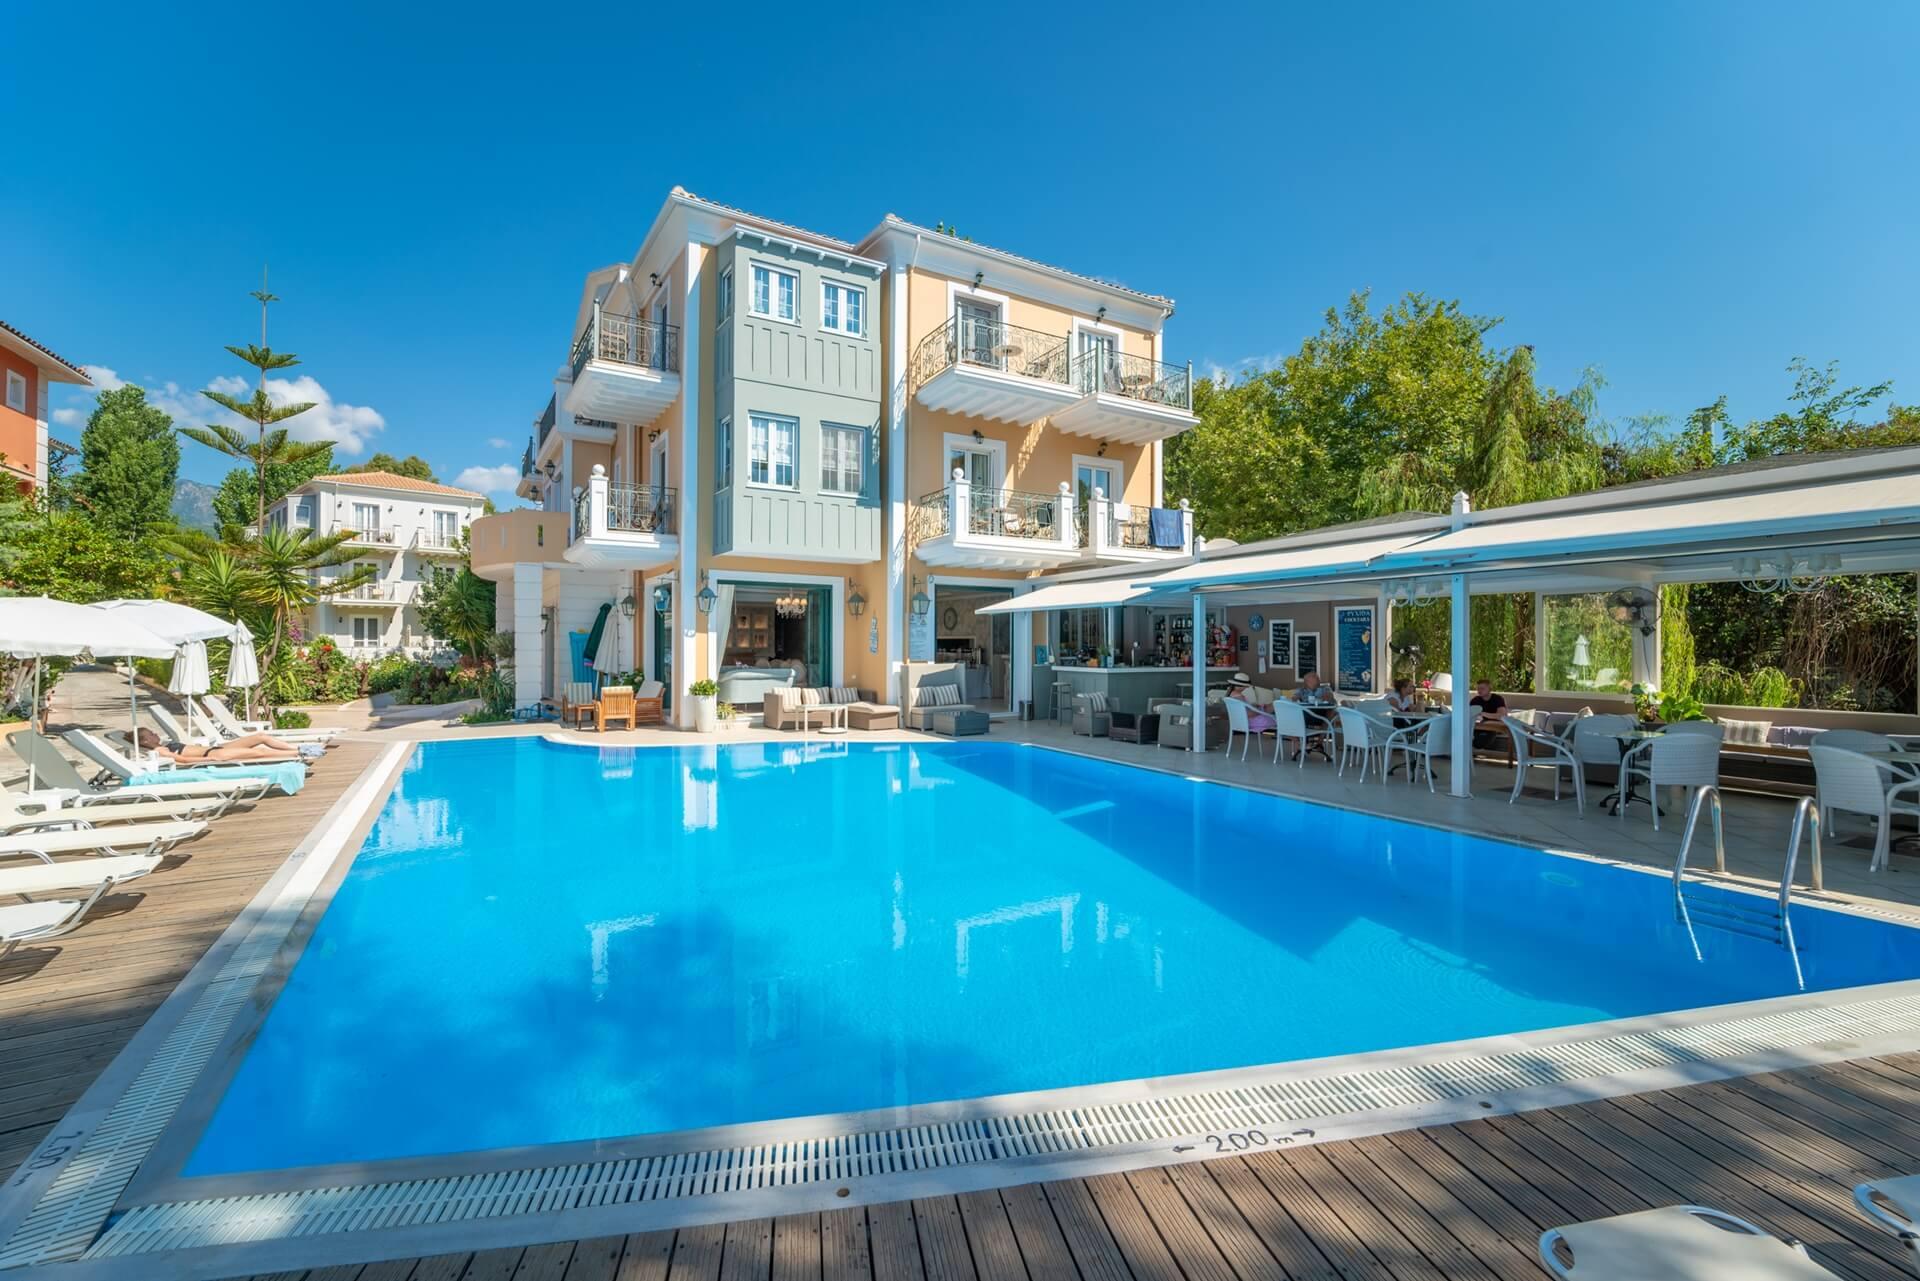 Pool view in sea side hotel Orion in Nidri